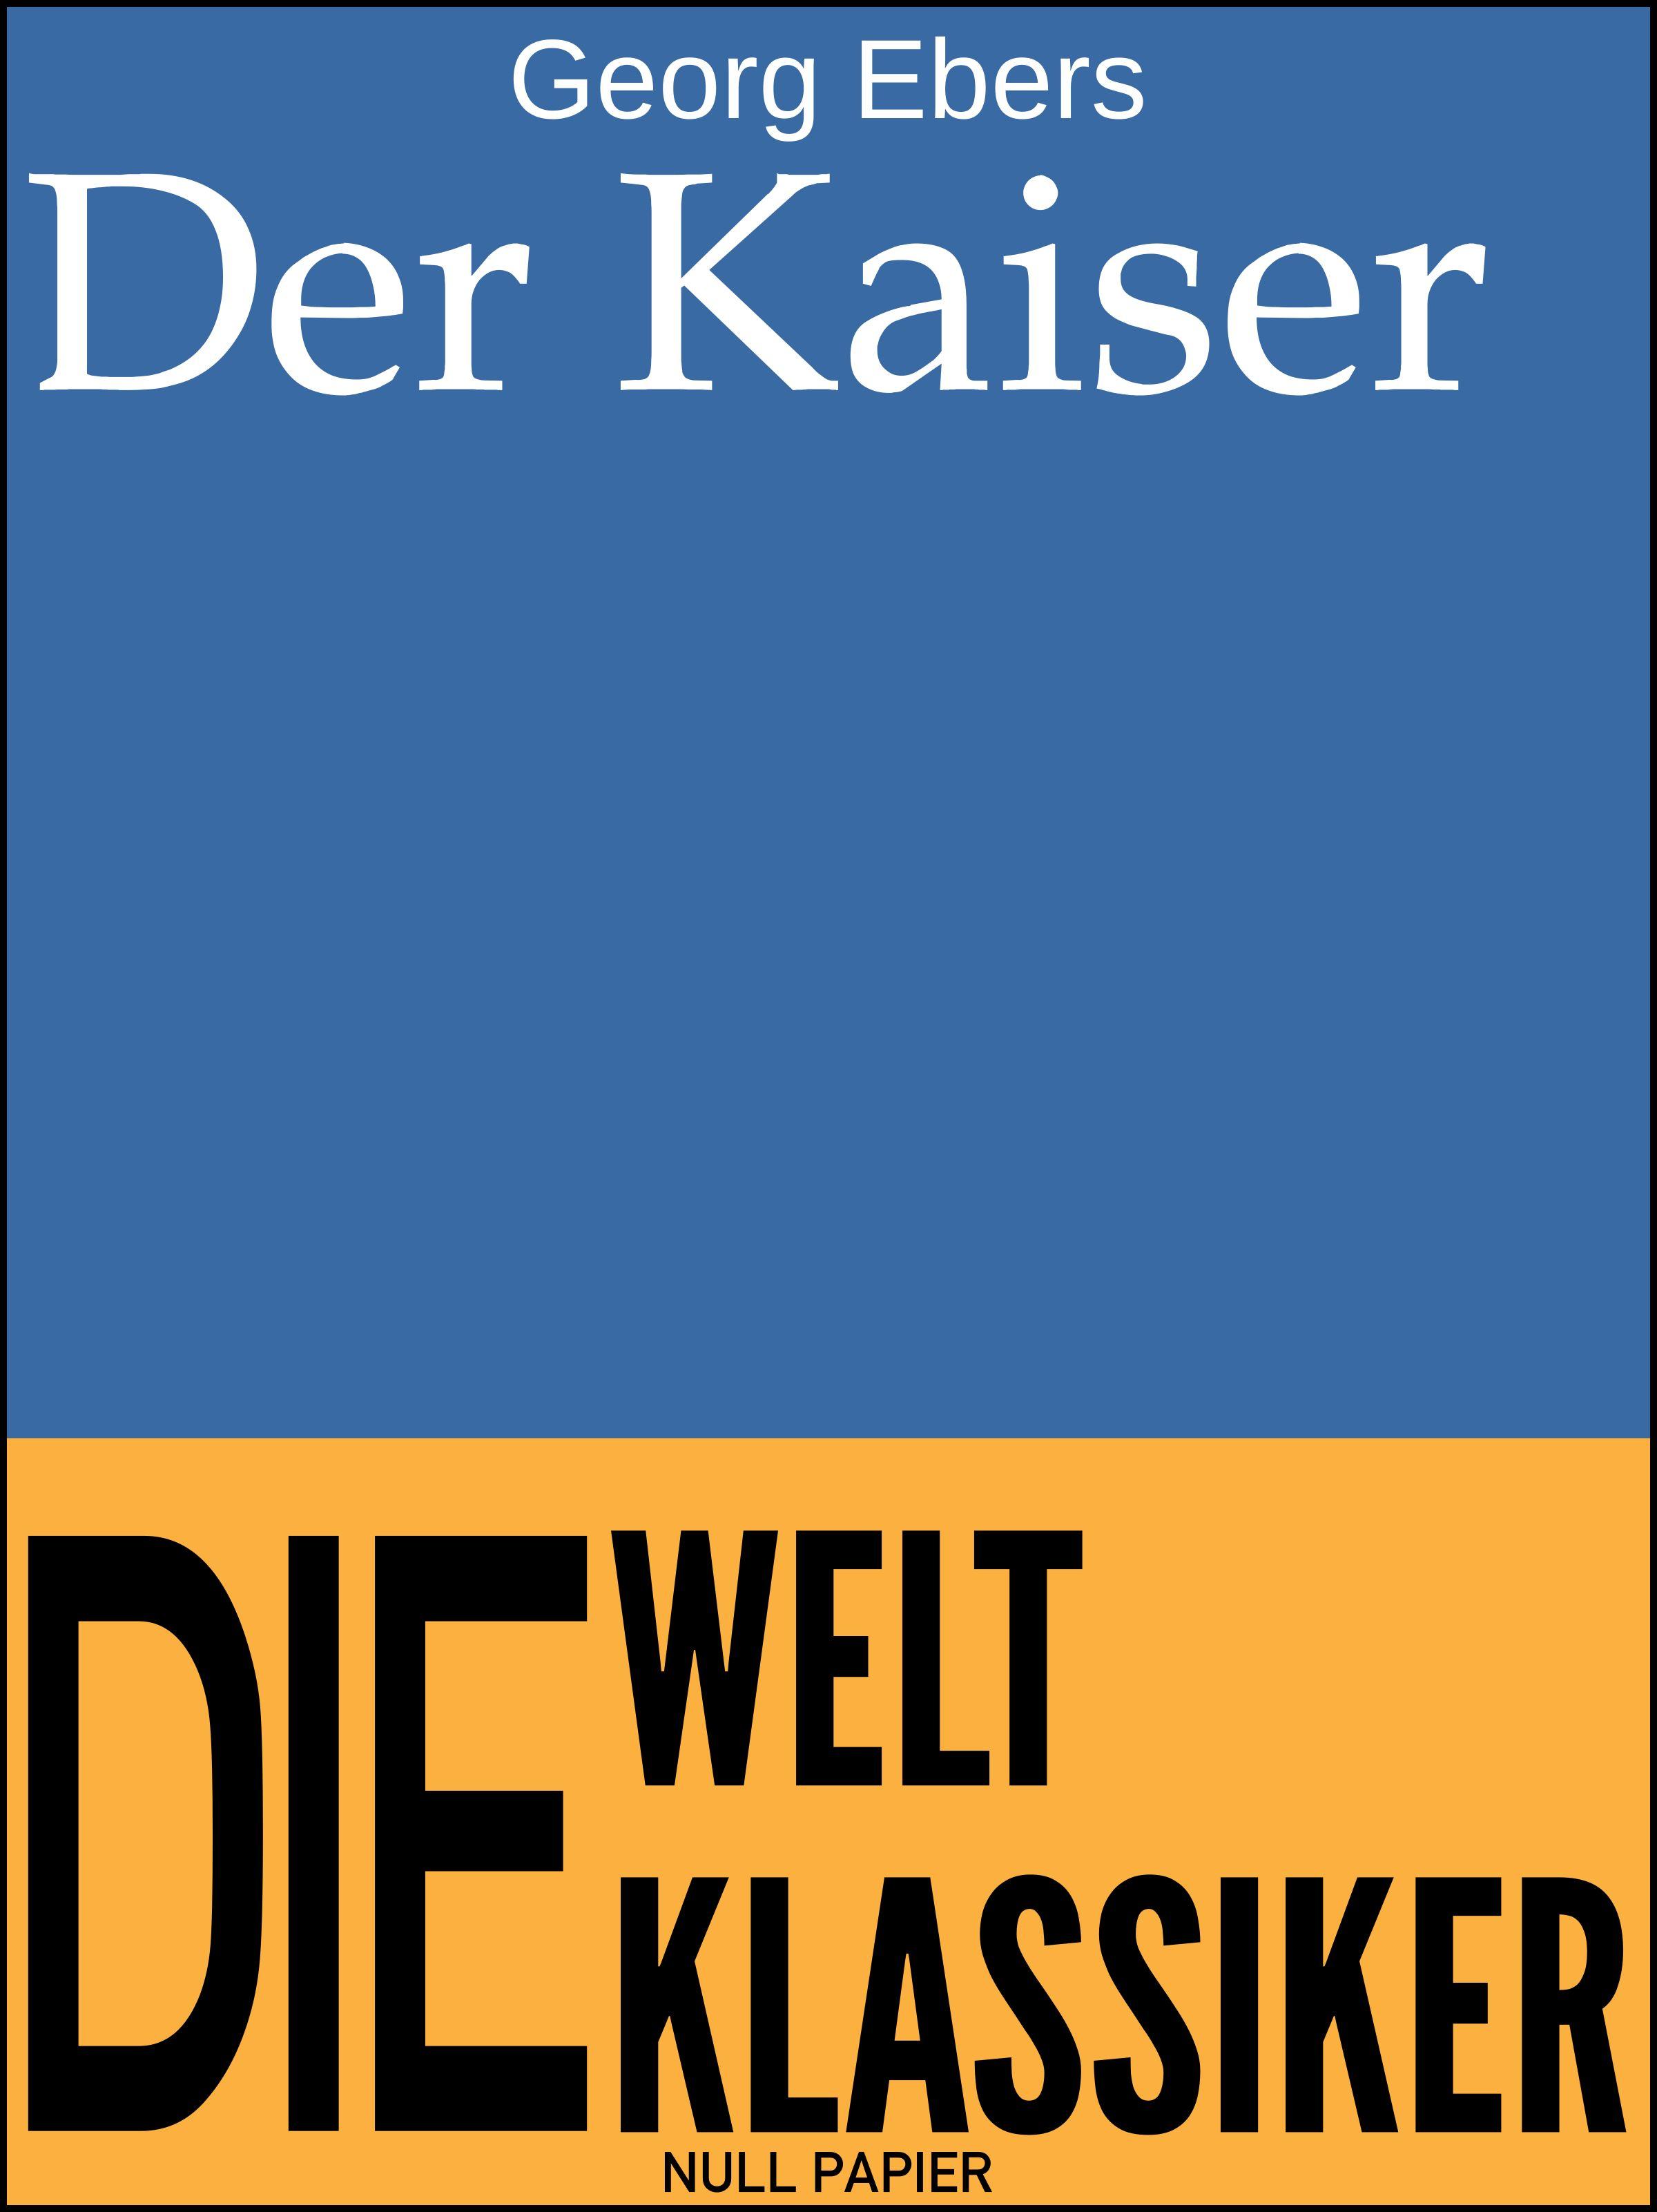 Georg Ebers Der Kaiser